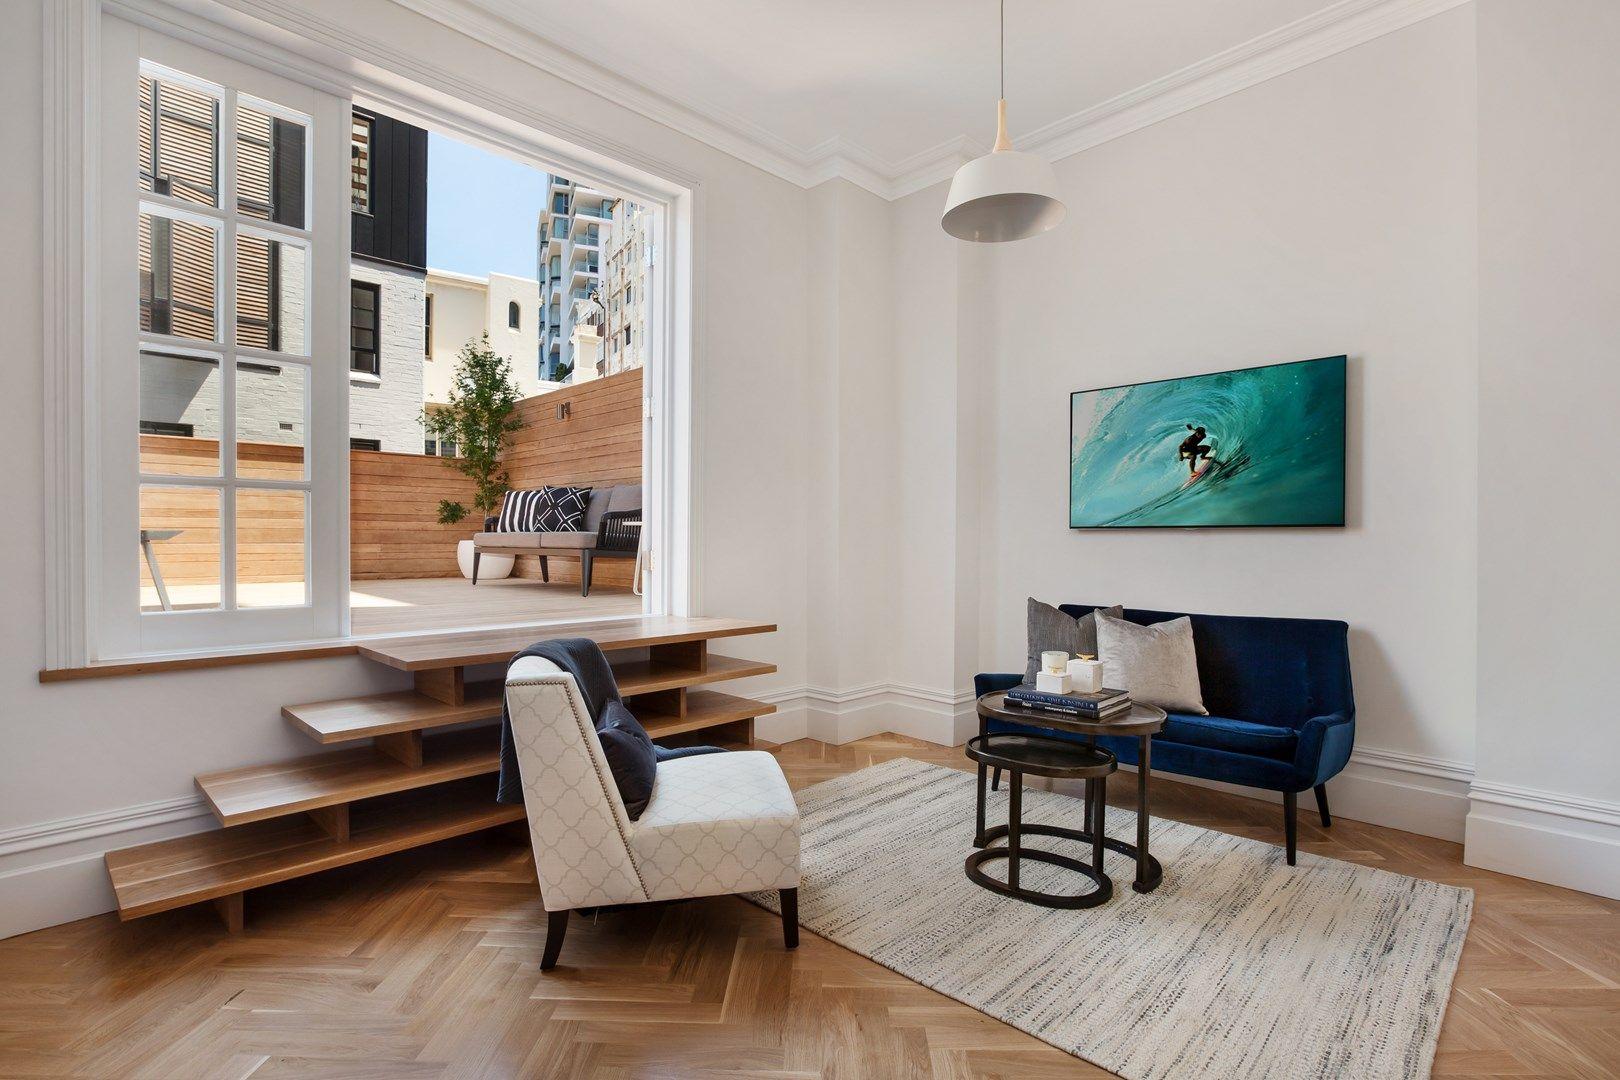 3/51 Elizabeth Bay Road, Elizabeth Bay NSW 2011 - Apartment For Sale - 2013245186